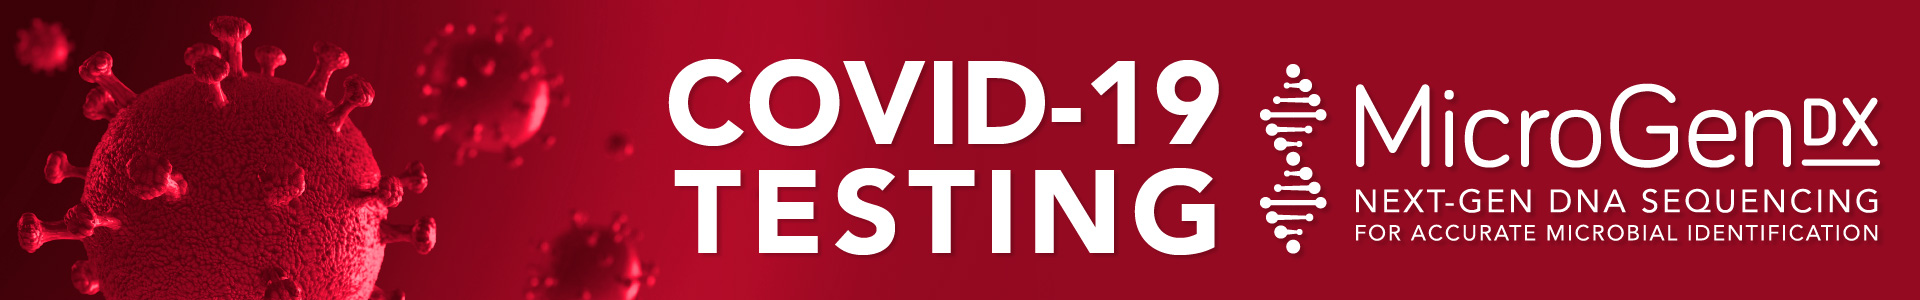 Covid-19 Testing | MicroGenDX